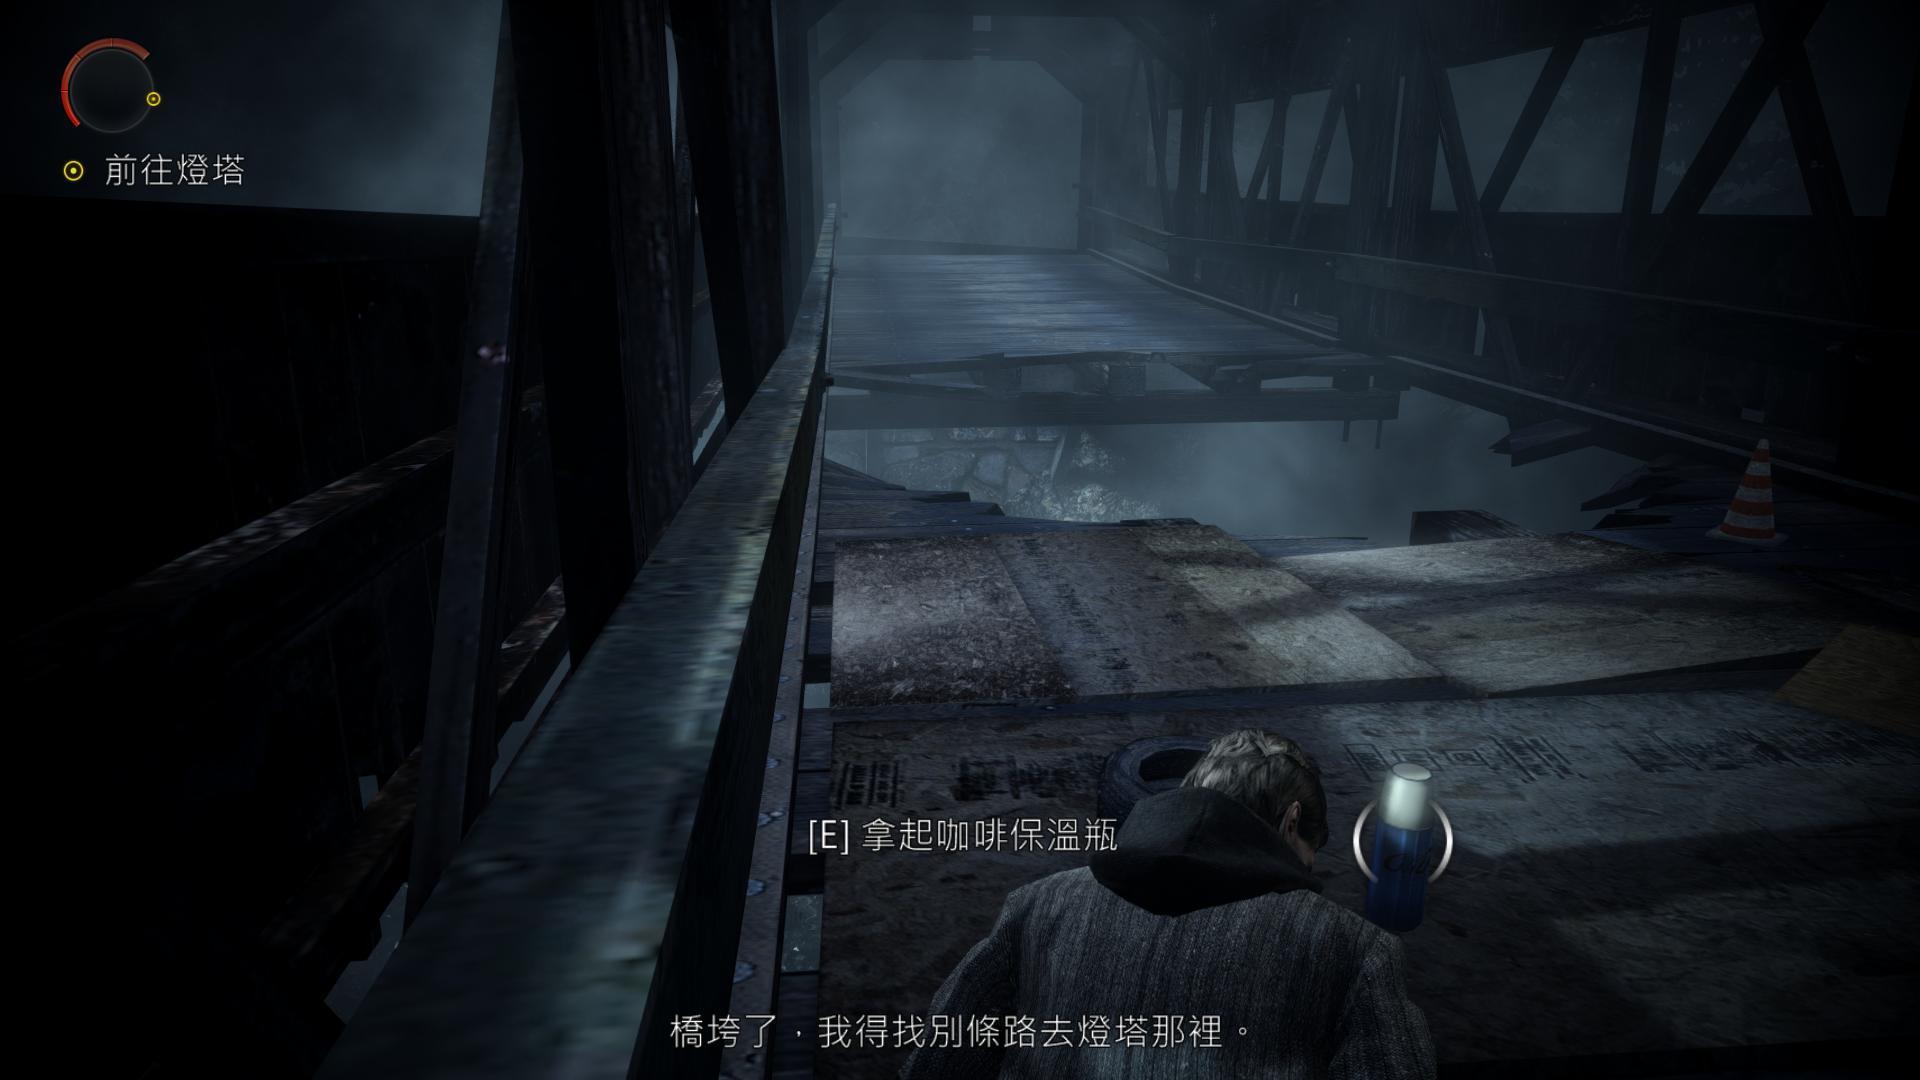 心灵杀手/阿兰醒醒 /Alan Wake插图2